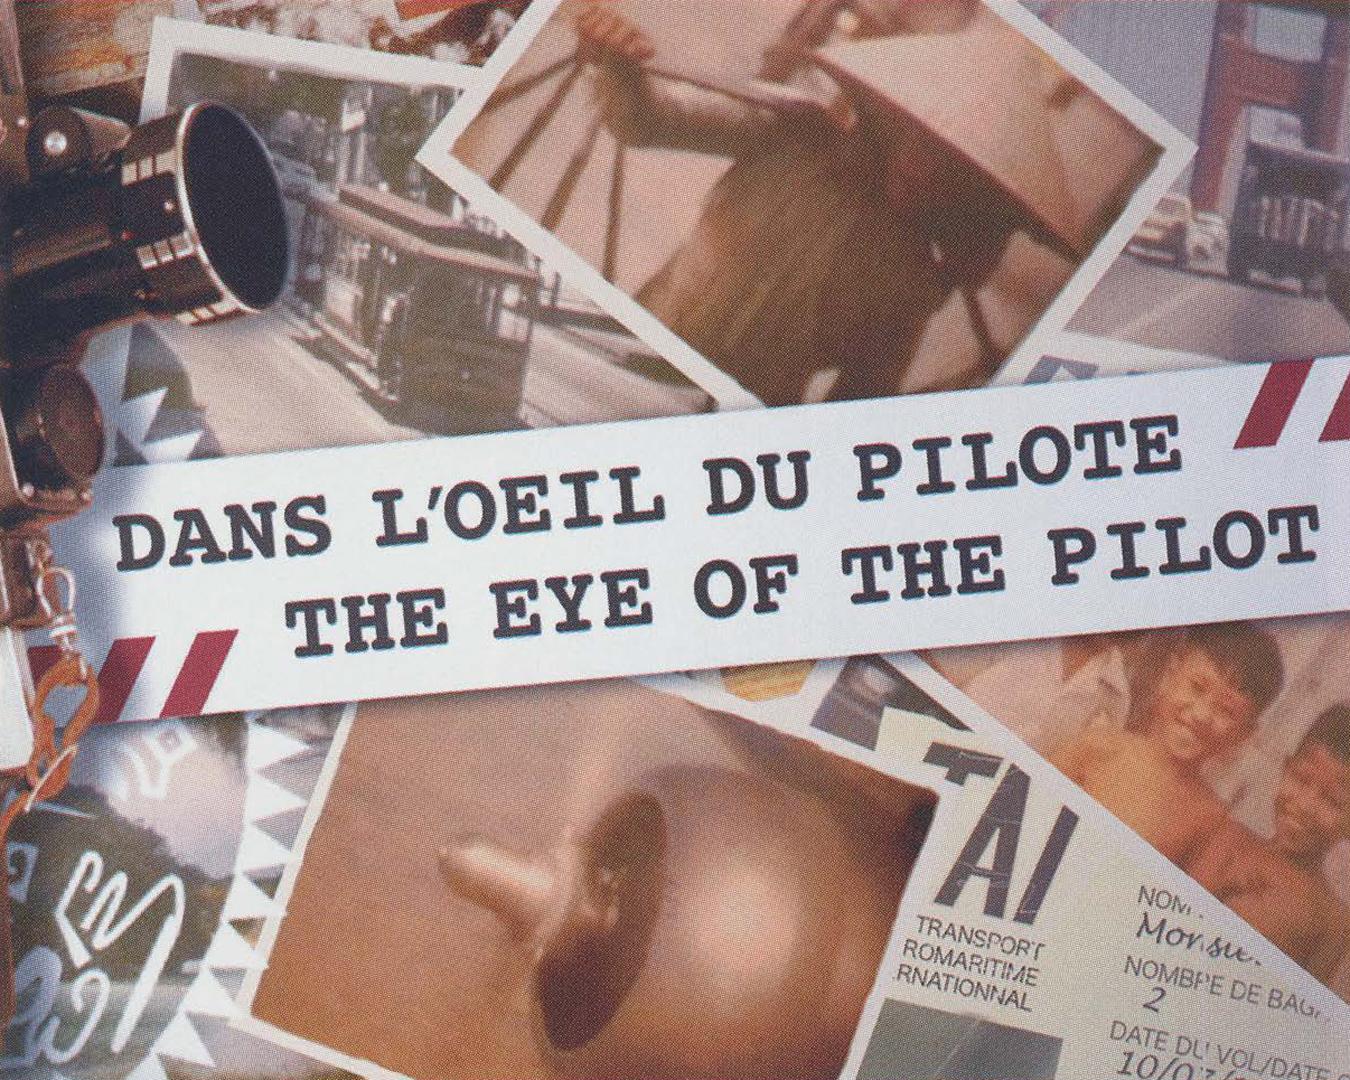 ©, Addictive TV, The Eye of the Pilot